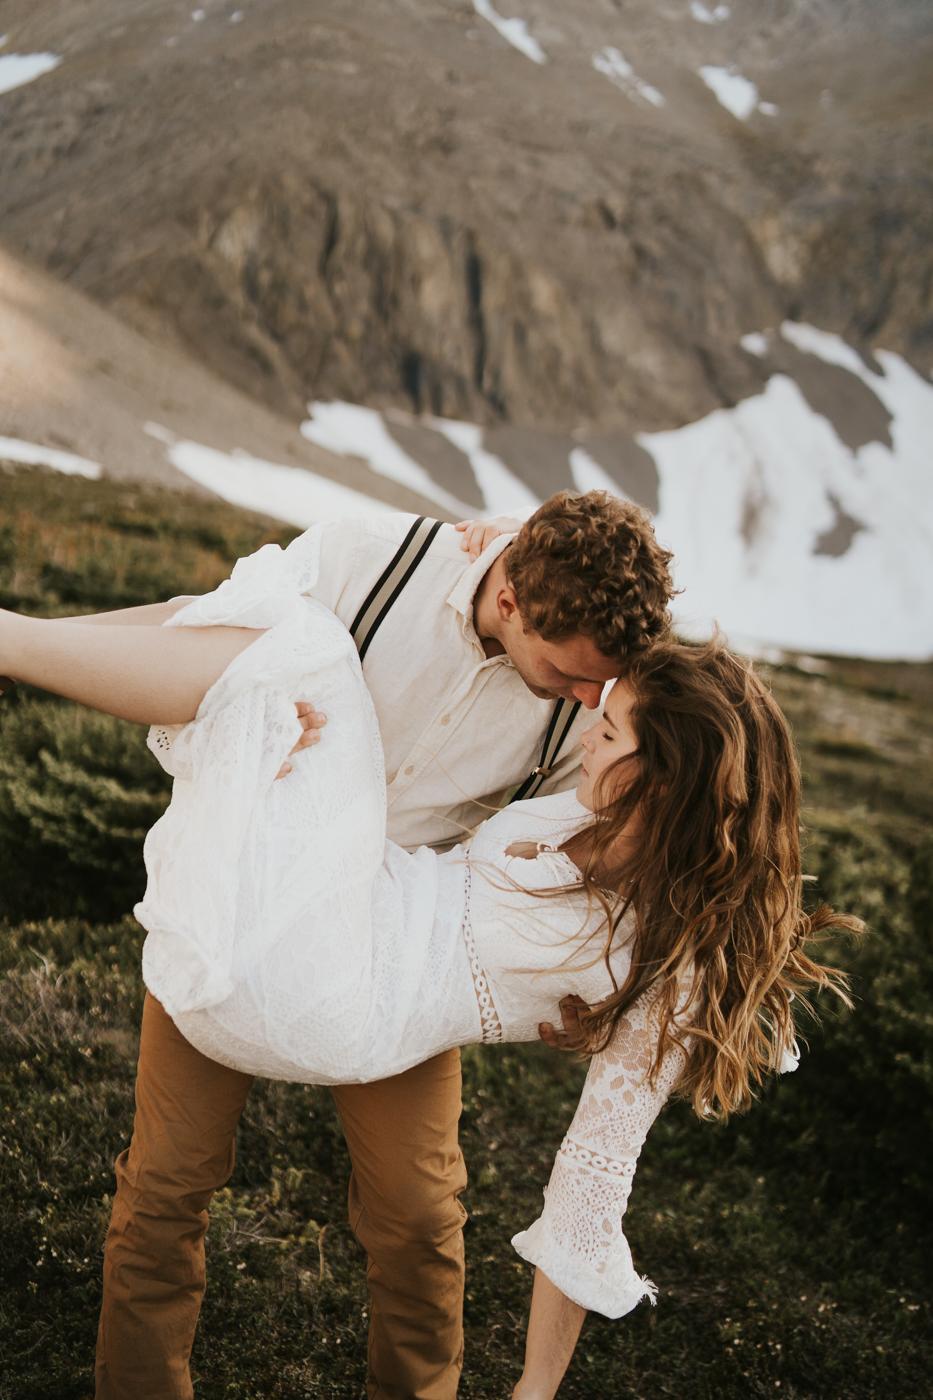 tyraephotography_photographer_wedding_elopement_engagement_photography-08043.jpg